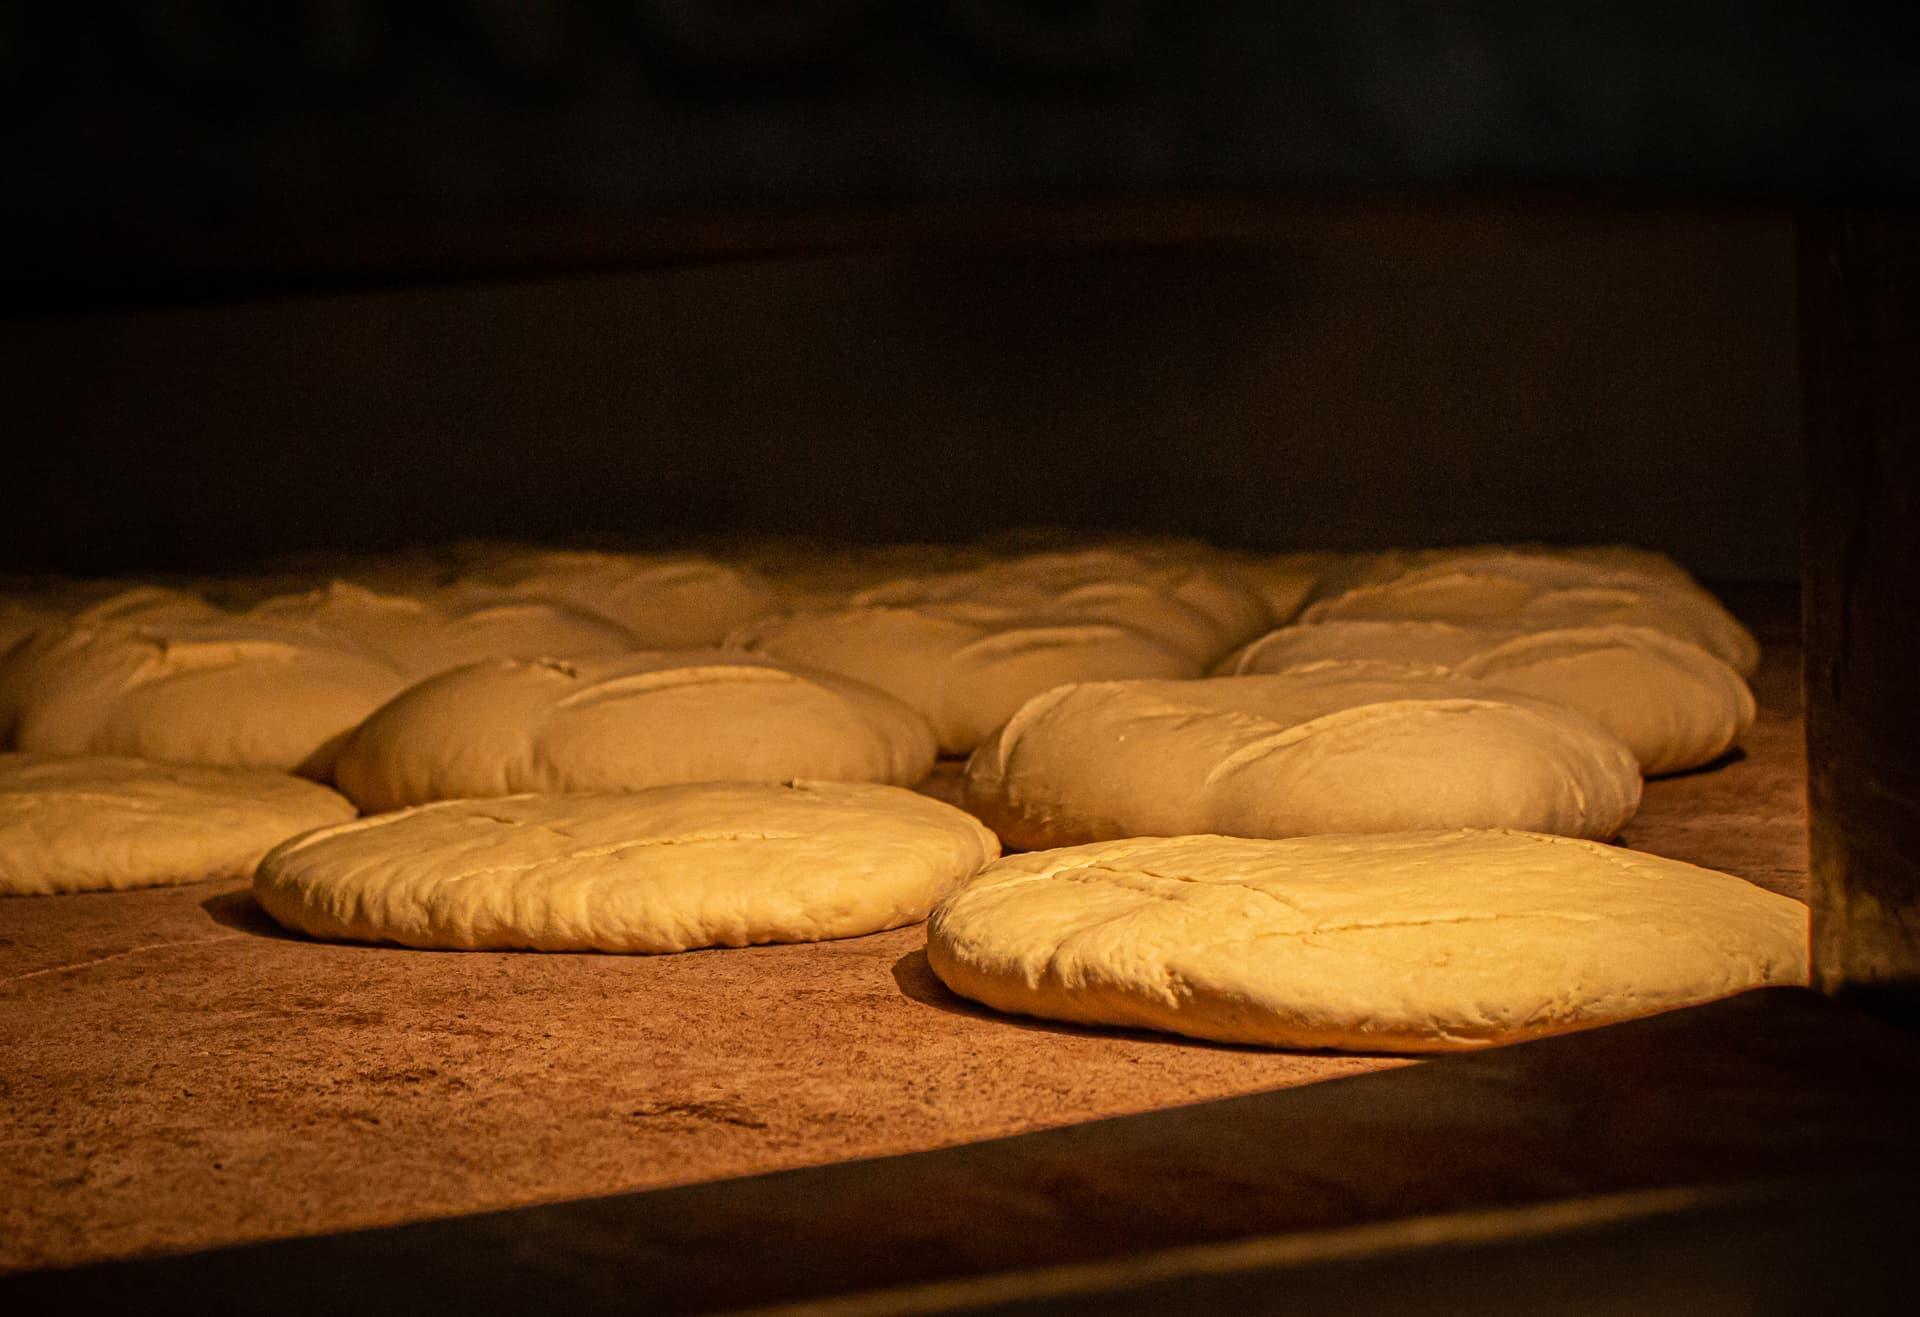 Pan de León Panadería Villabente dentro del horno